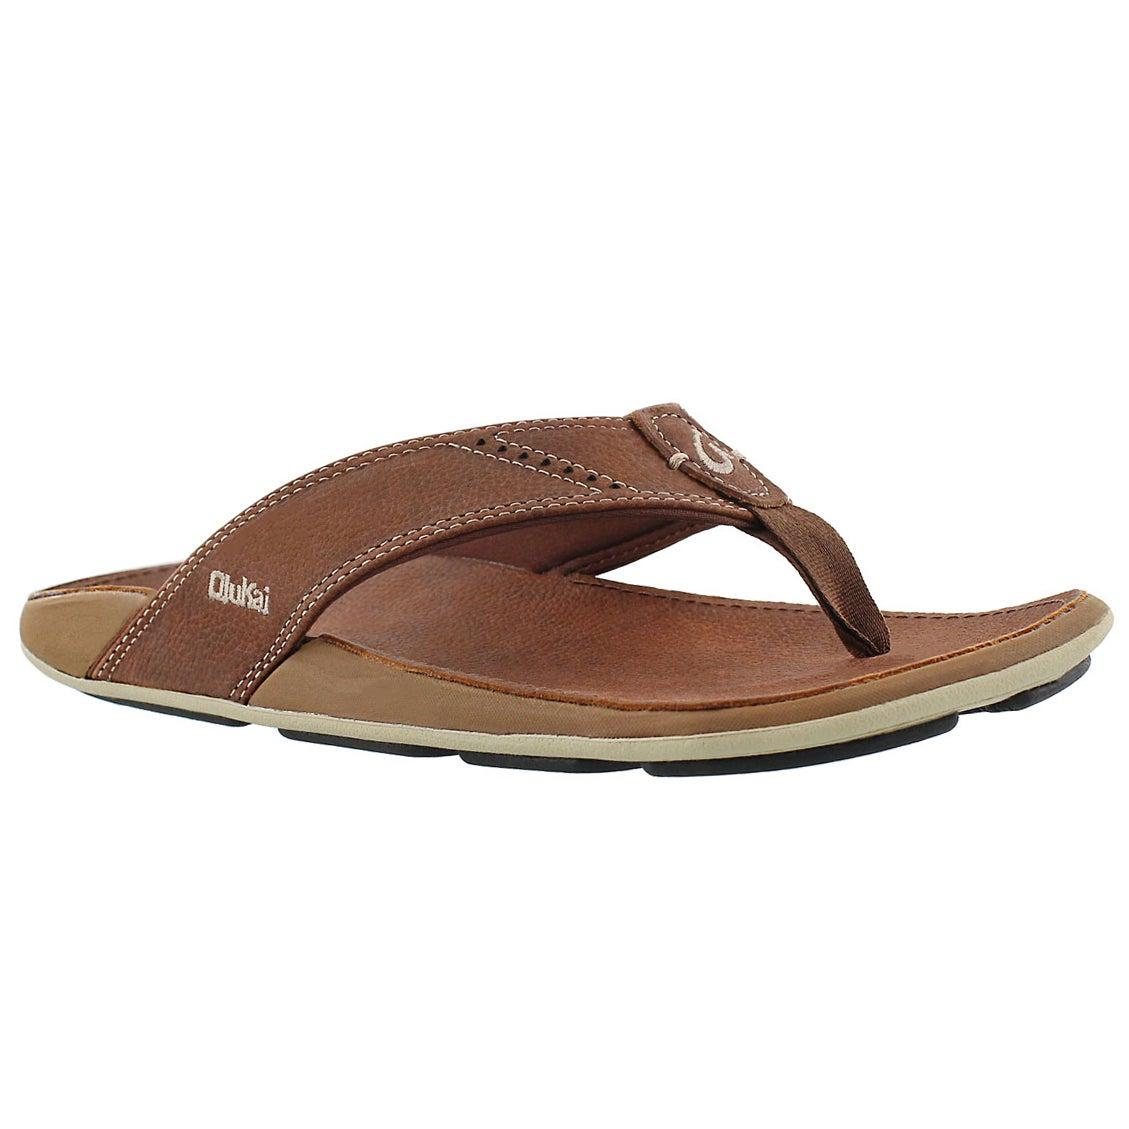 Mns Nui rum thong sandal